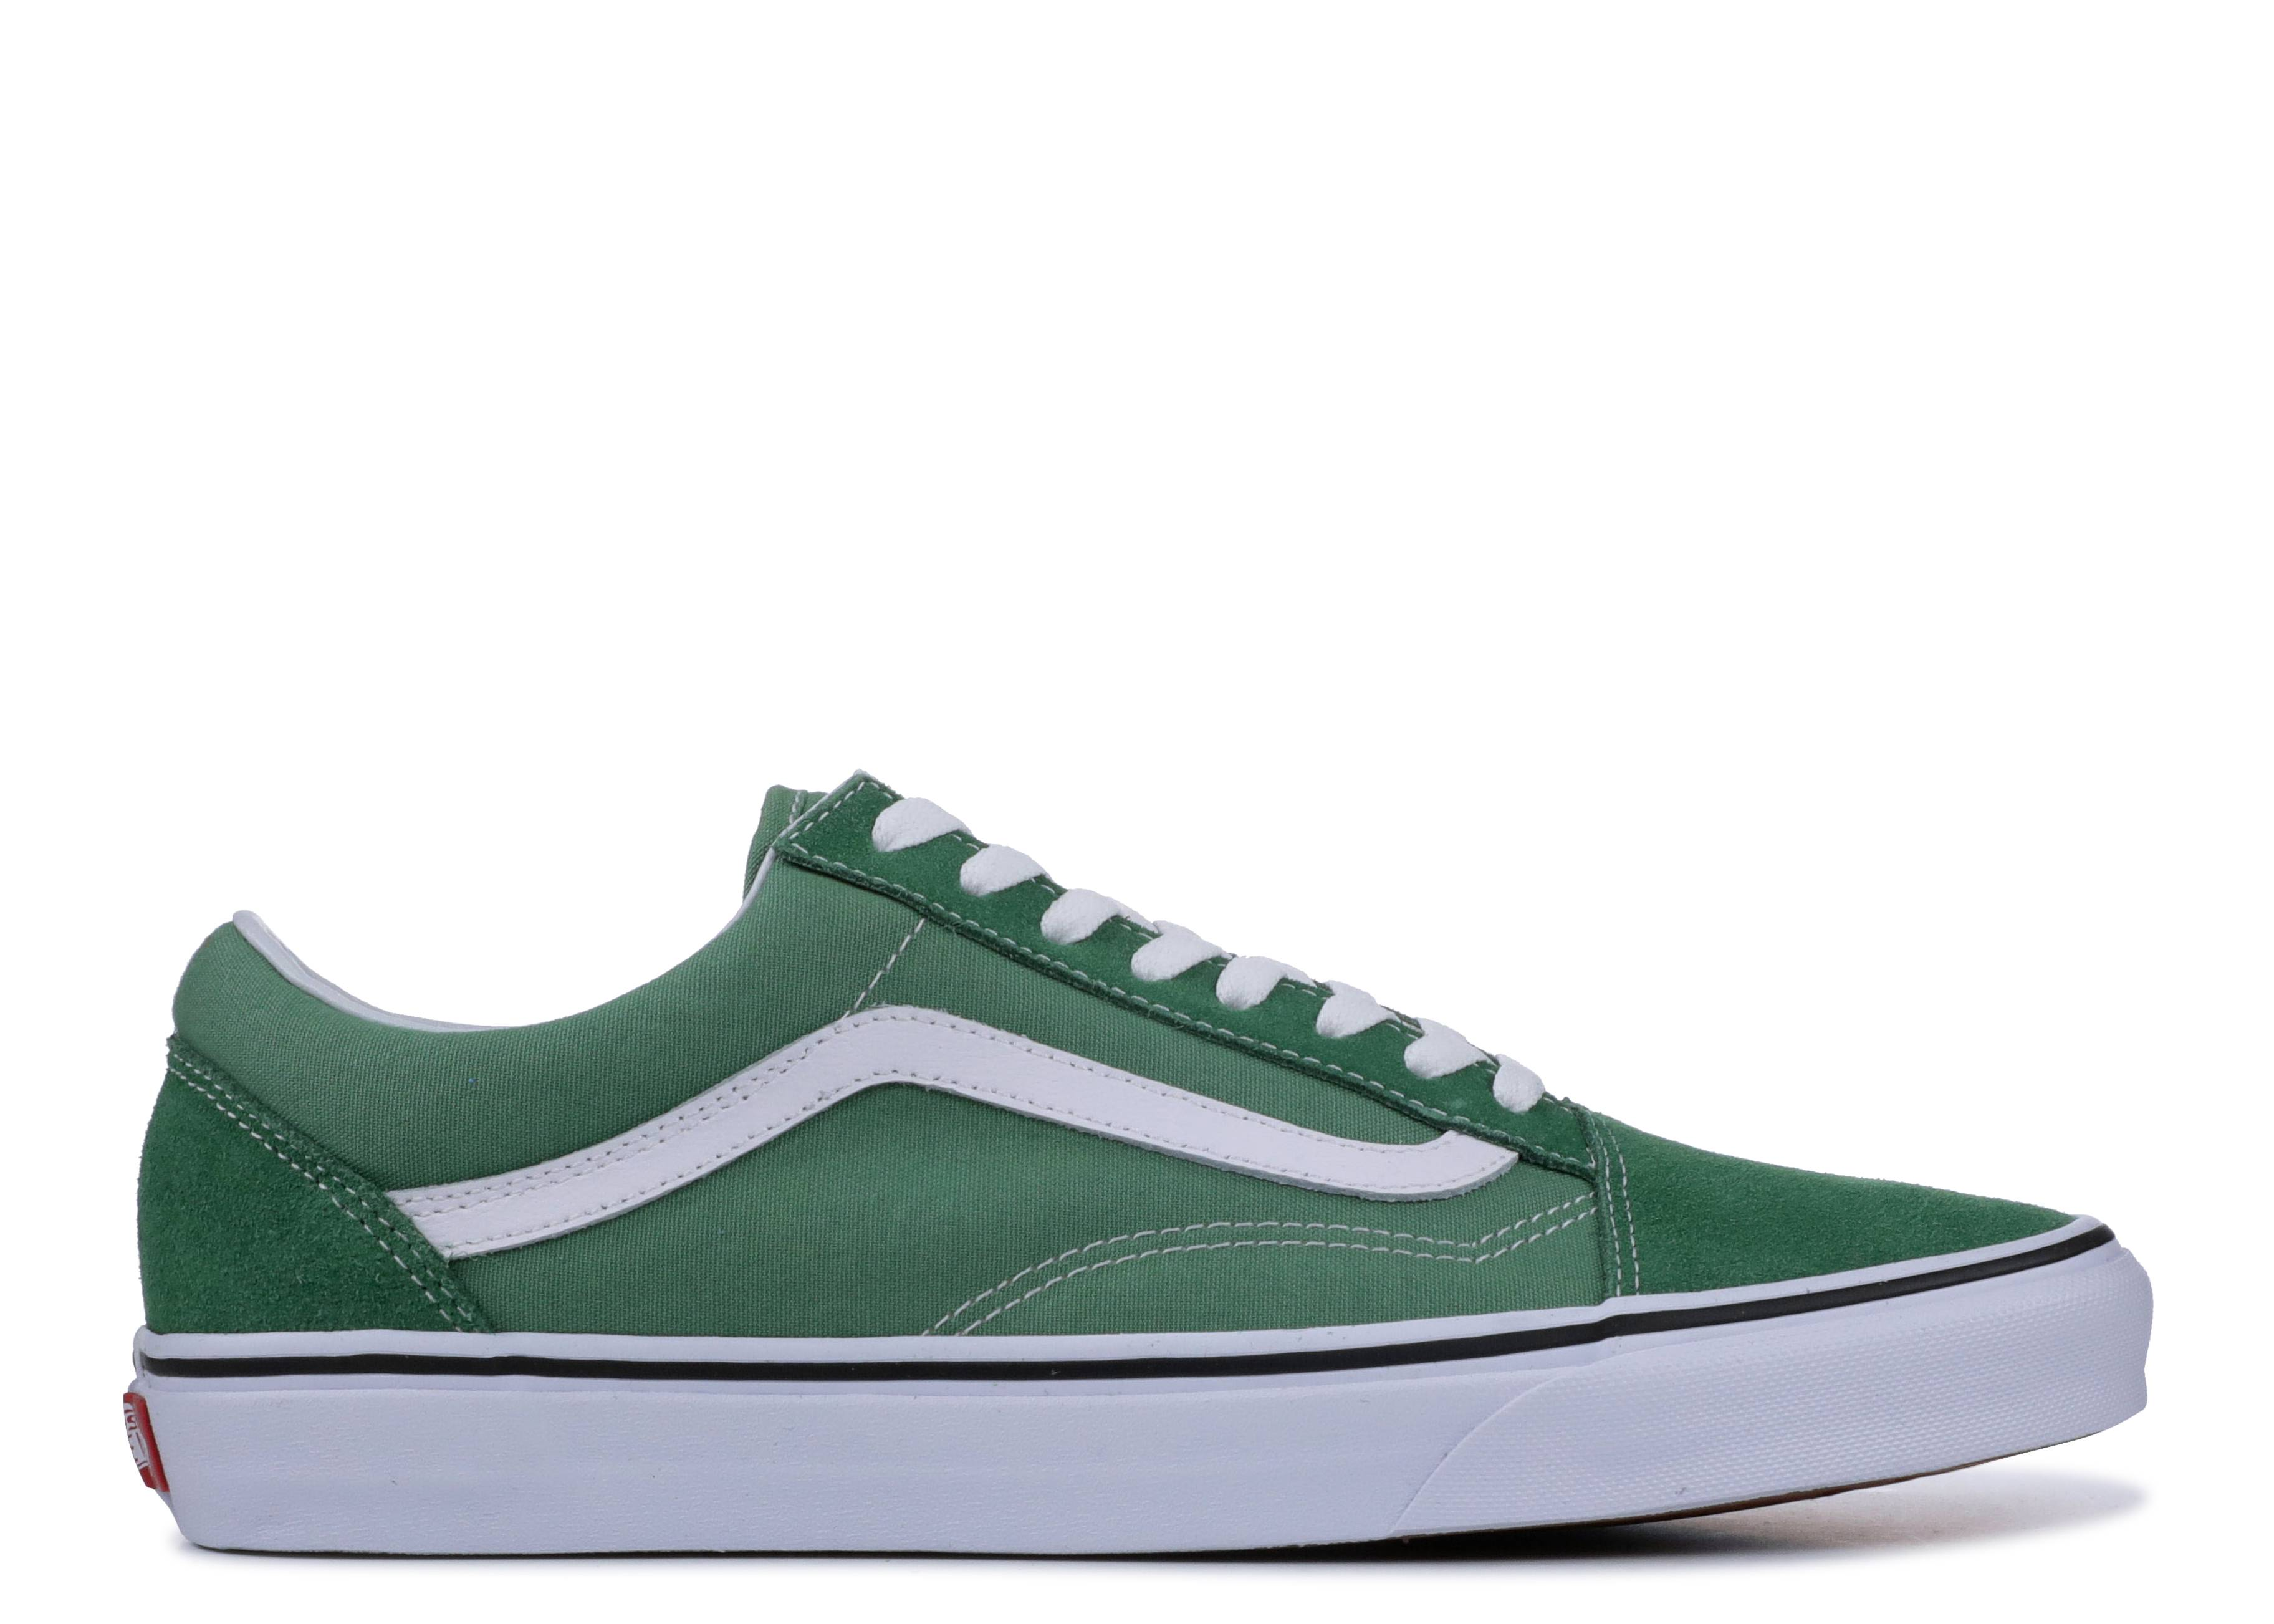 VANS OLD SKOOL Grass GreenTrue White Men's Size 6 9 New in